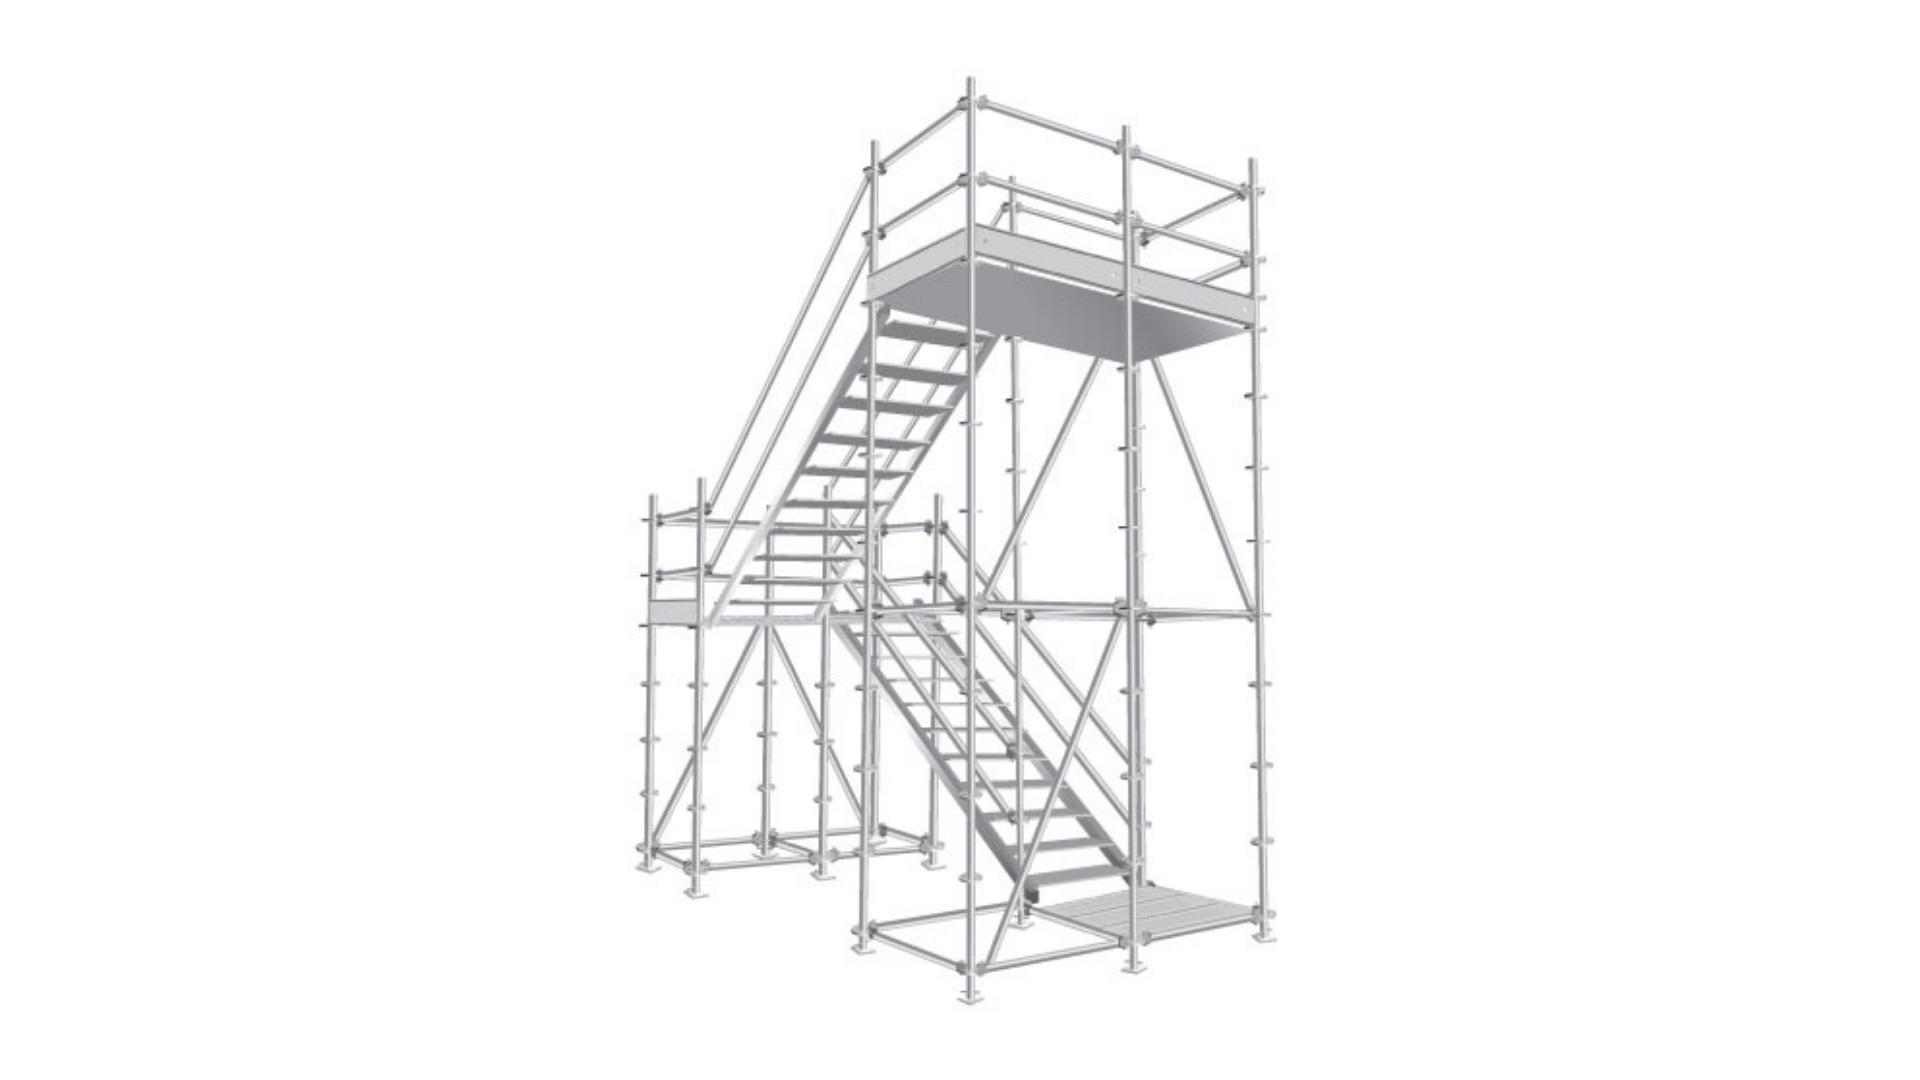 escada de acesso 03